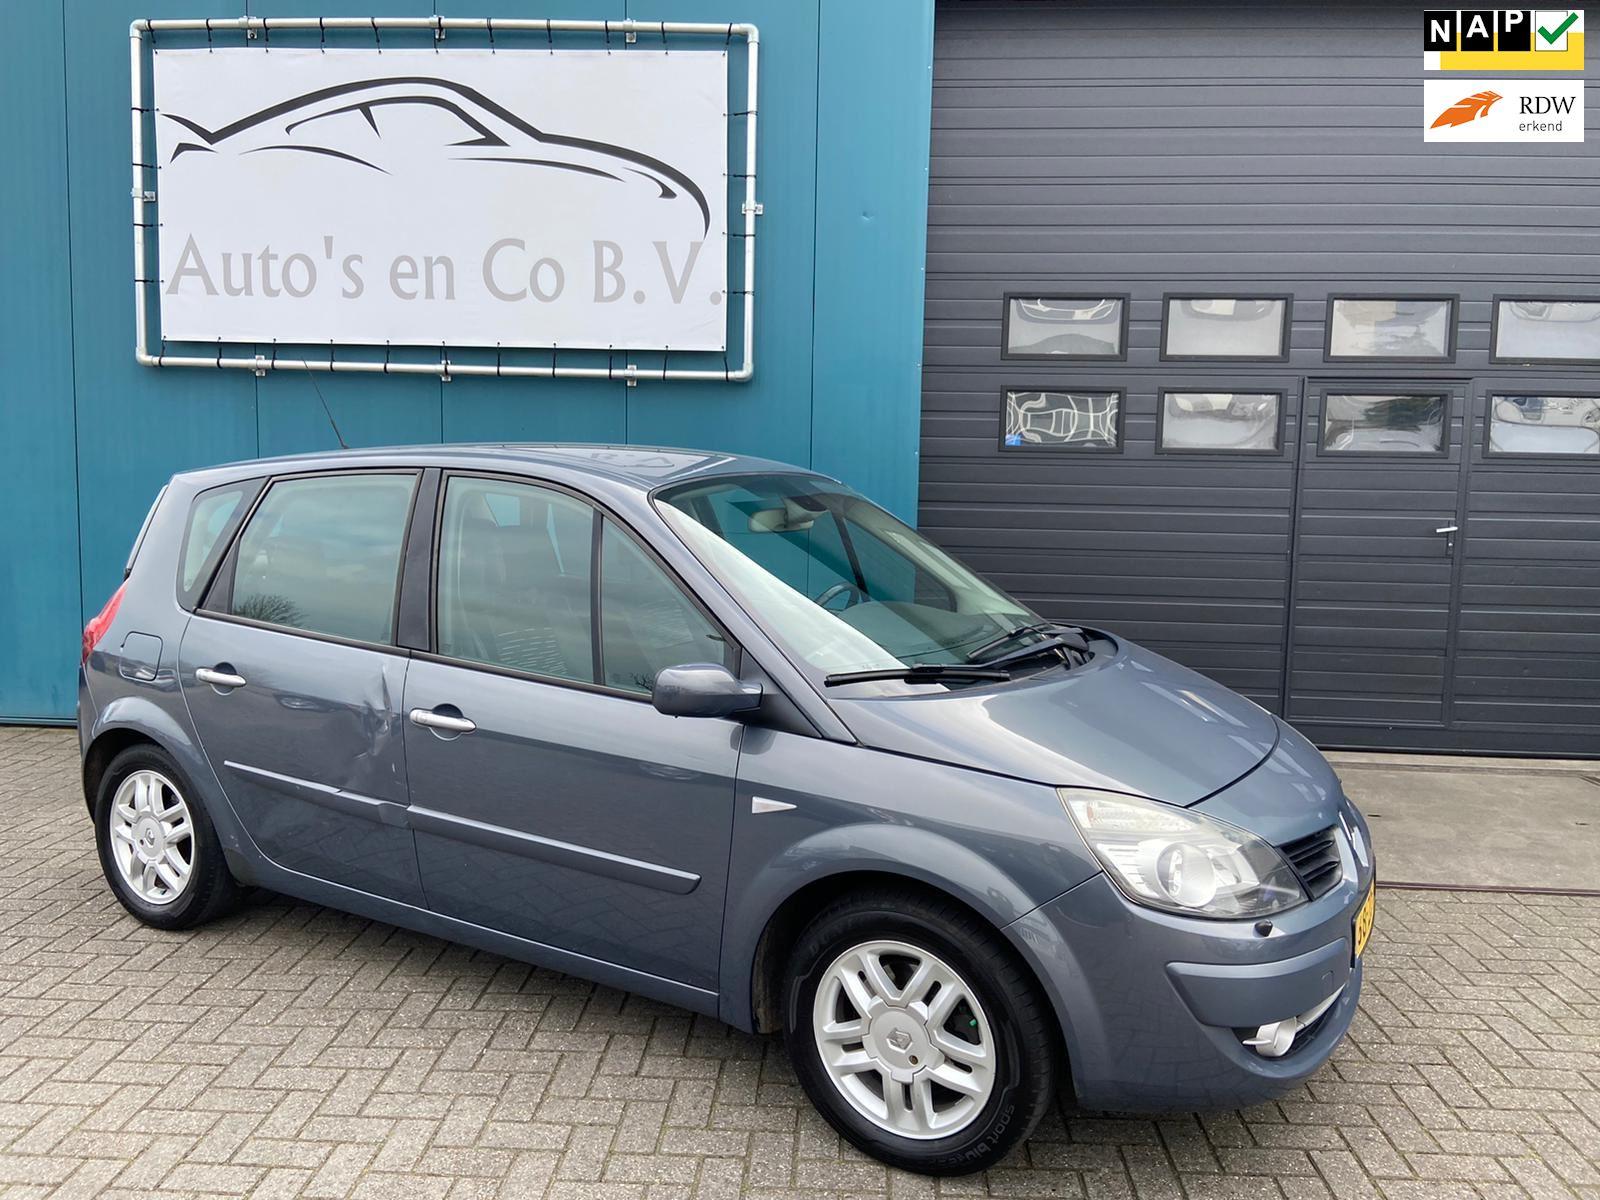 Renault Scénic occasion - Auto's en Co B.V.